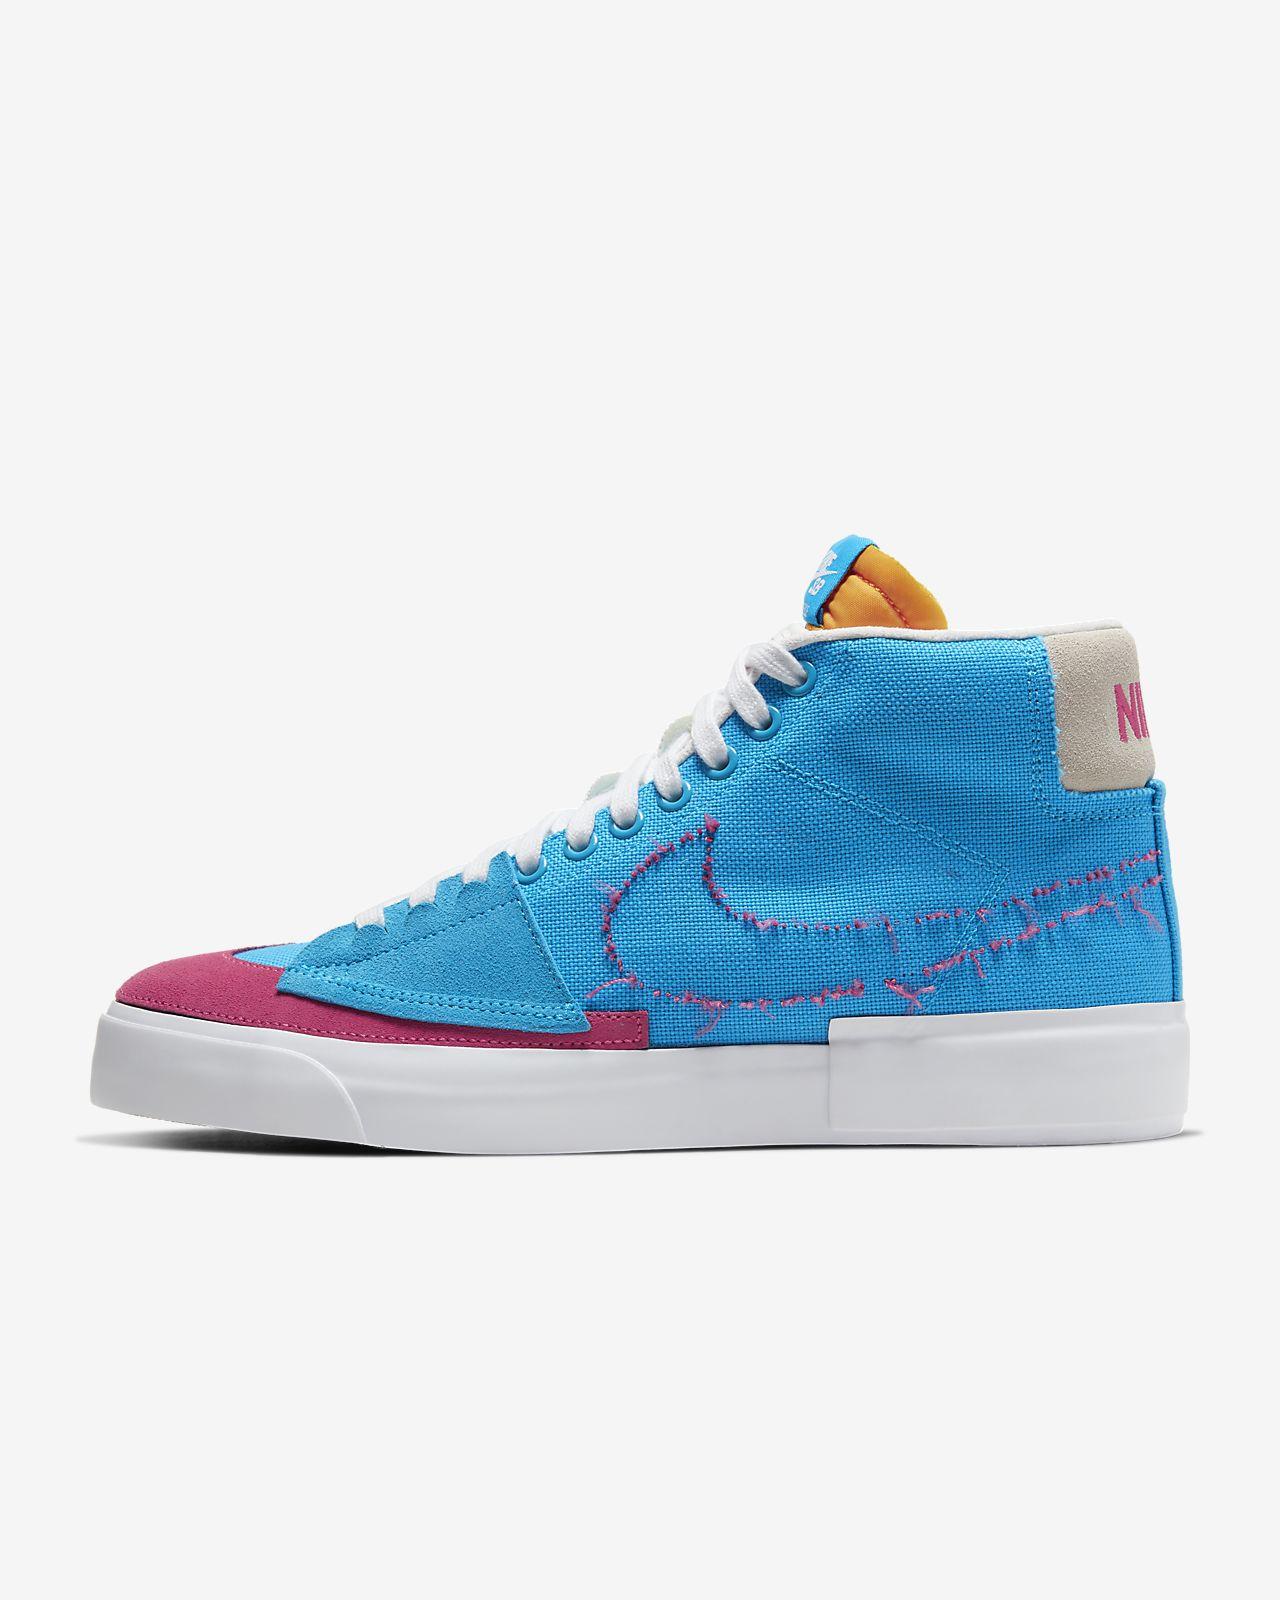 Zoom Scarpa Nike SB Blazer Mid da skateboard Edge n0kOP8wX